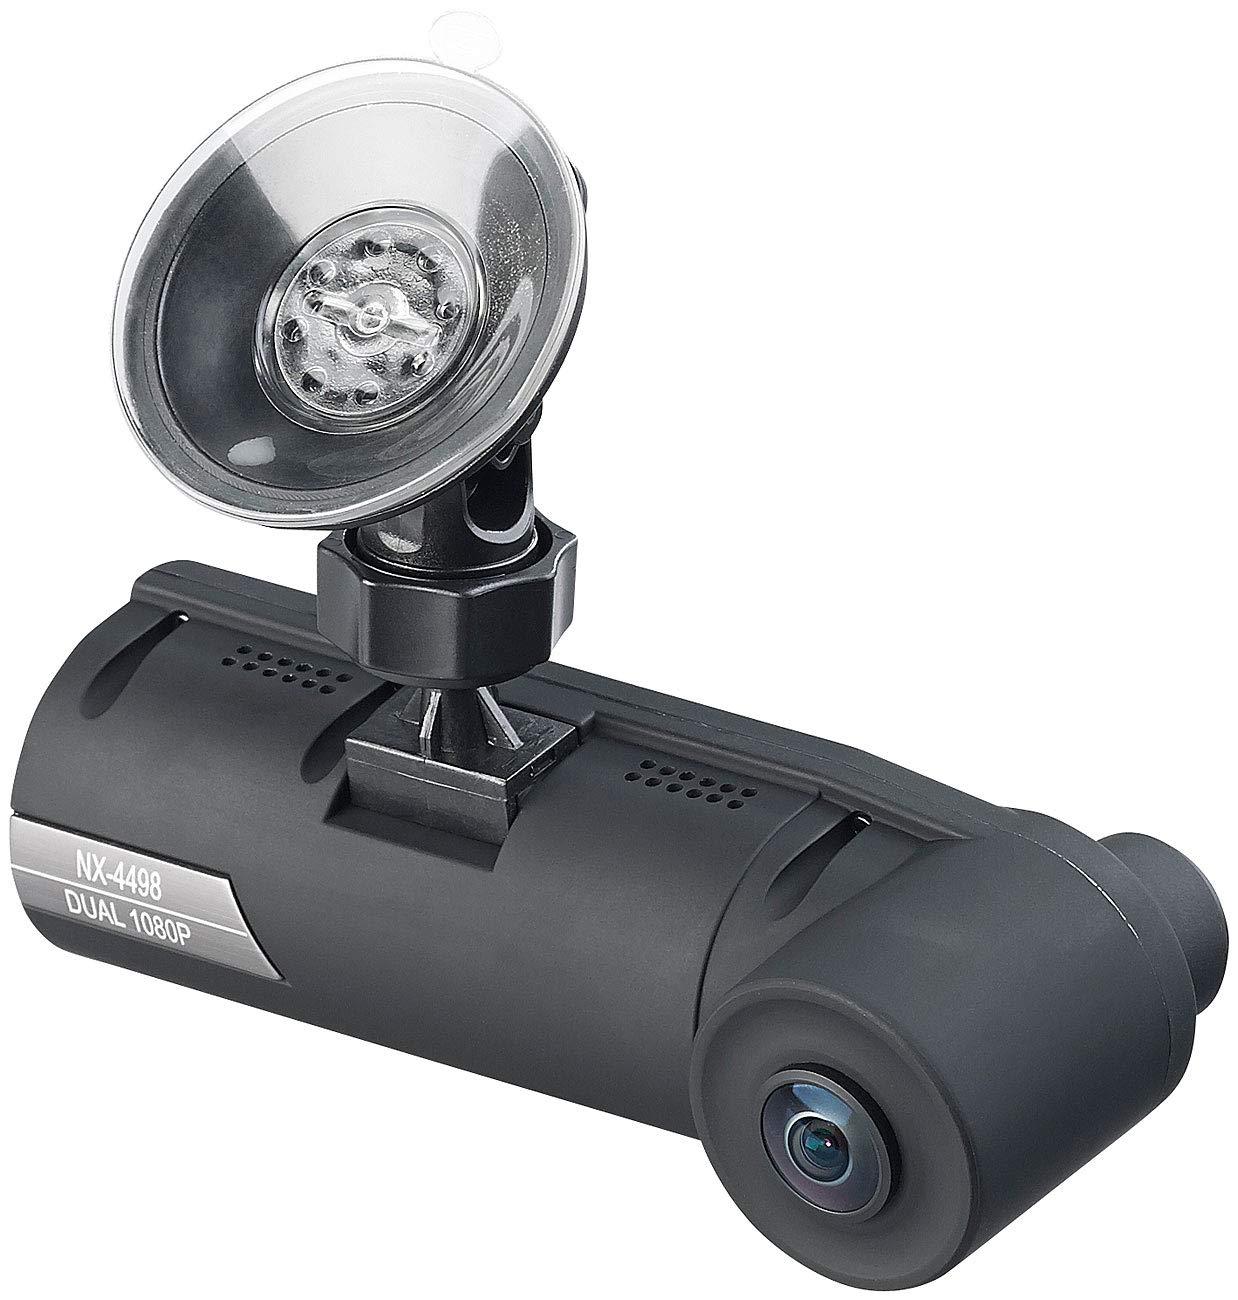 NavGear-Auto-Kamera-Full-HD-Dashcam-mit-2-Kameras-fr-360-Panorama-Sicht-G-Sensor-Dashcam-360-Grad